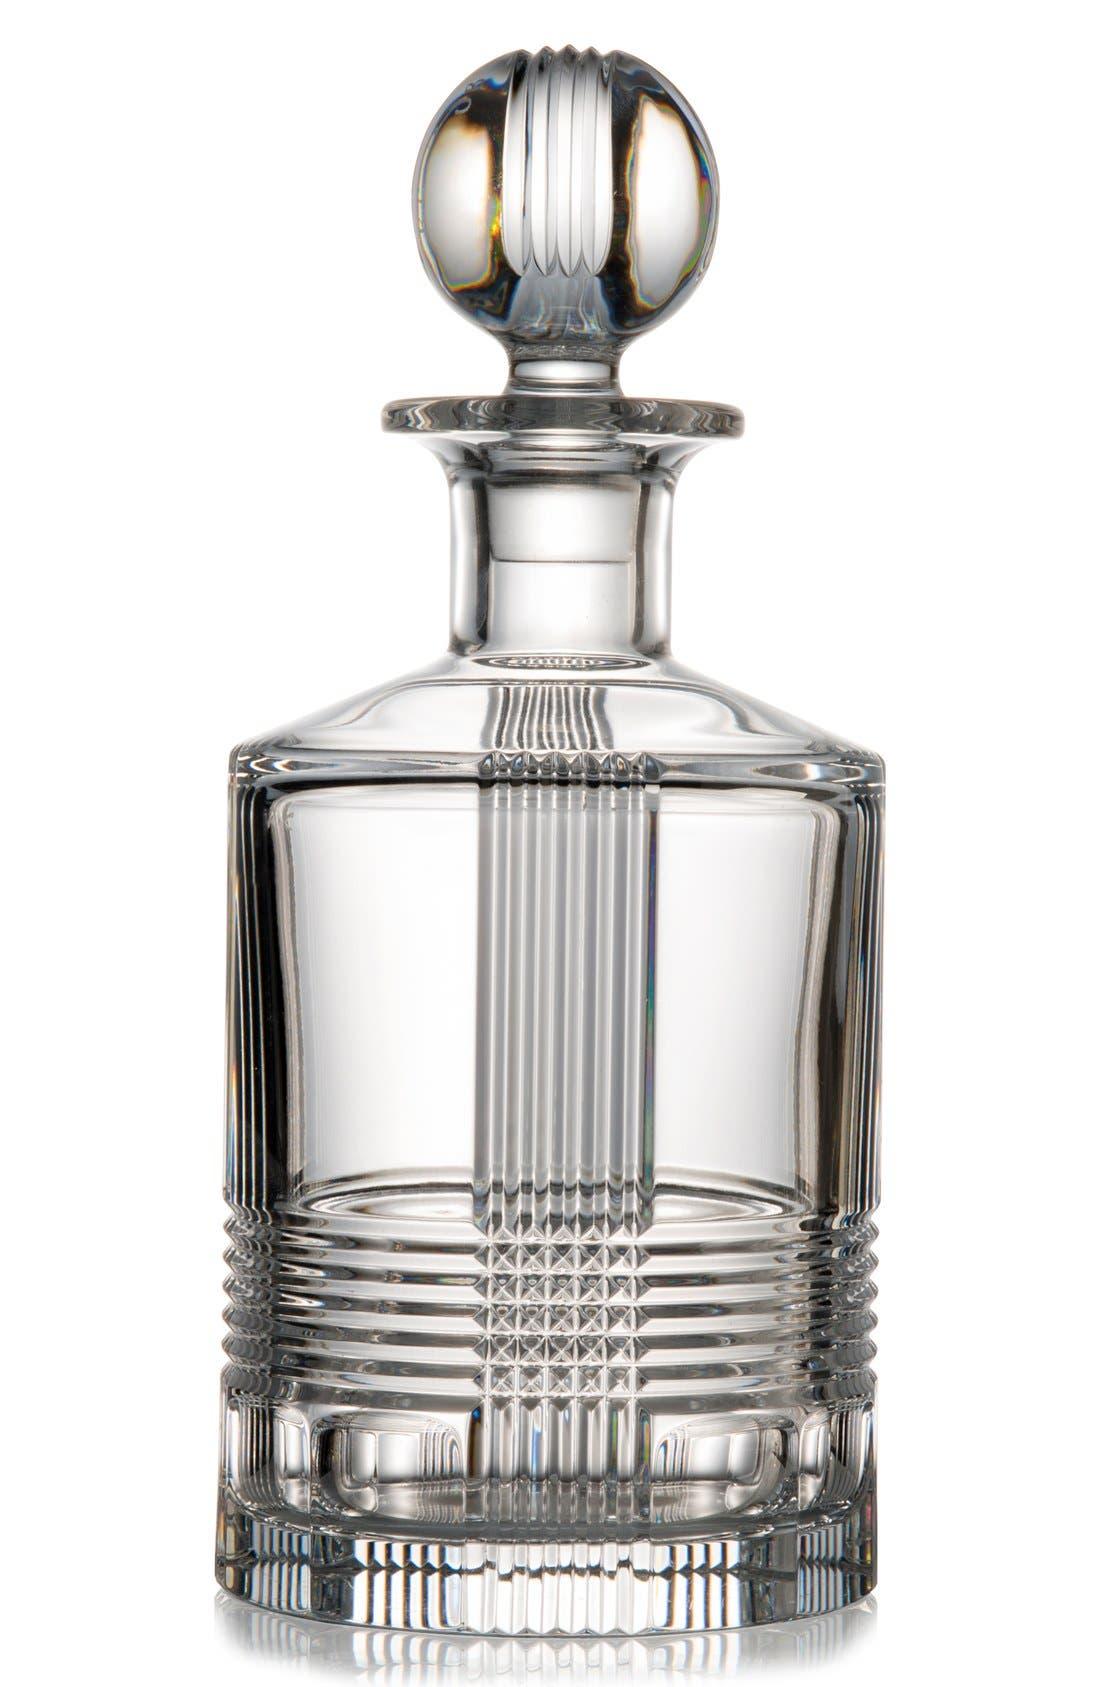 rogaska crystal u0027fan clubu0027 lead crystal decanter